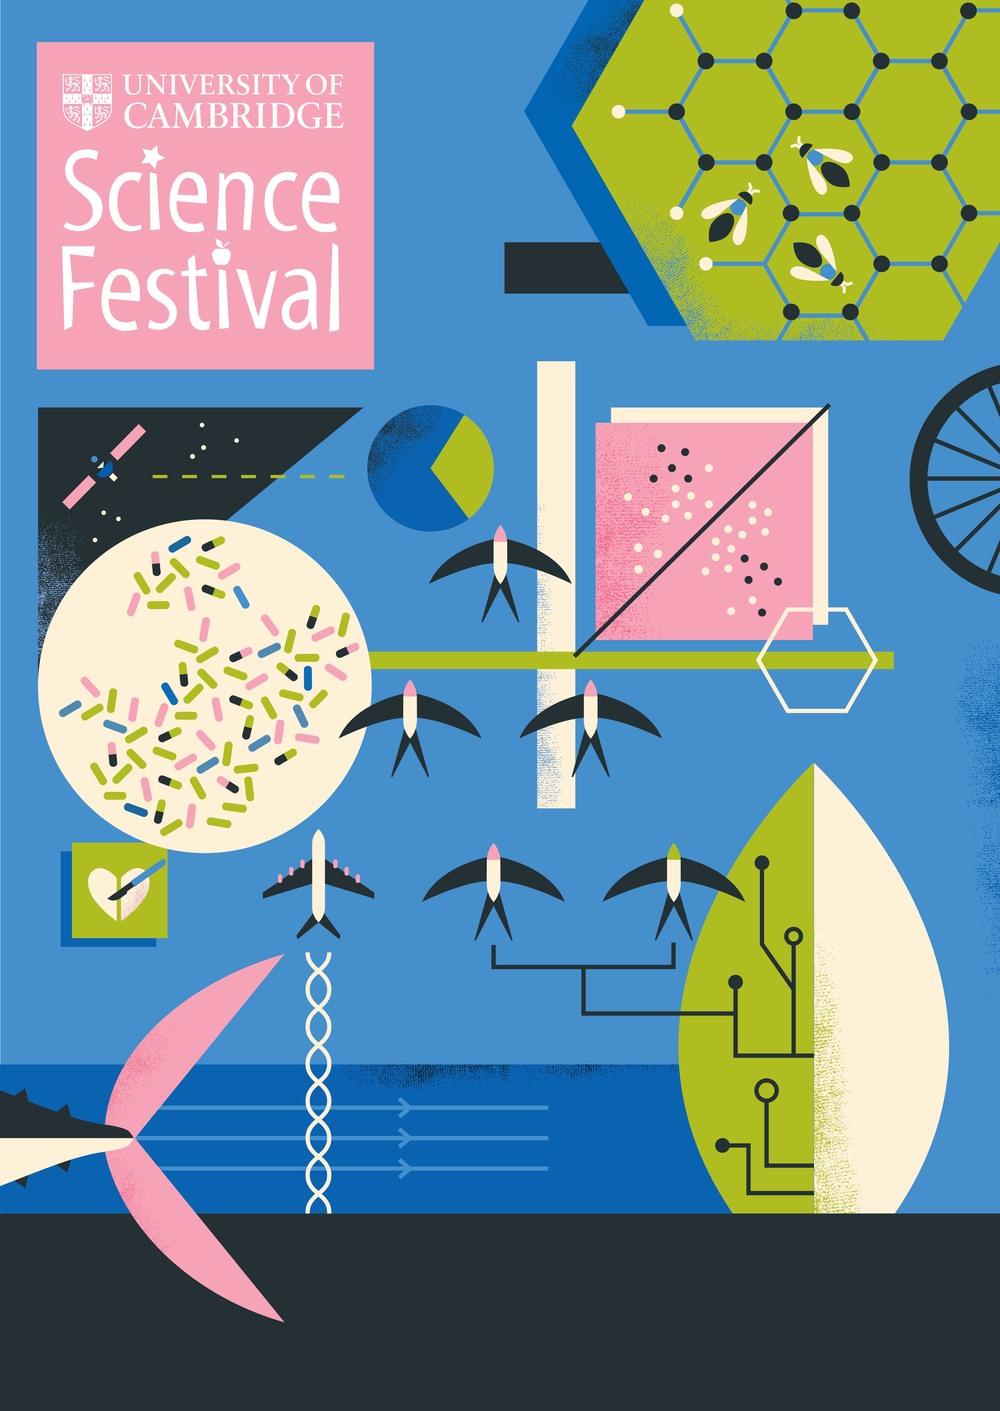 hannahalice-illustration-cambridgesciencefestival-cambridgeuniversity-cover.jpg